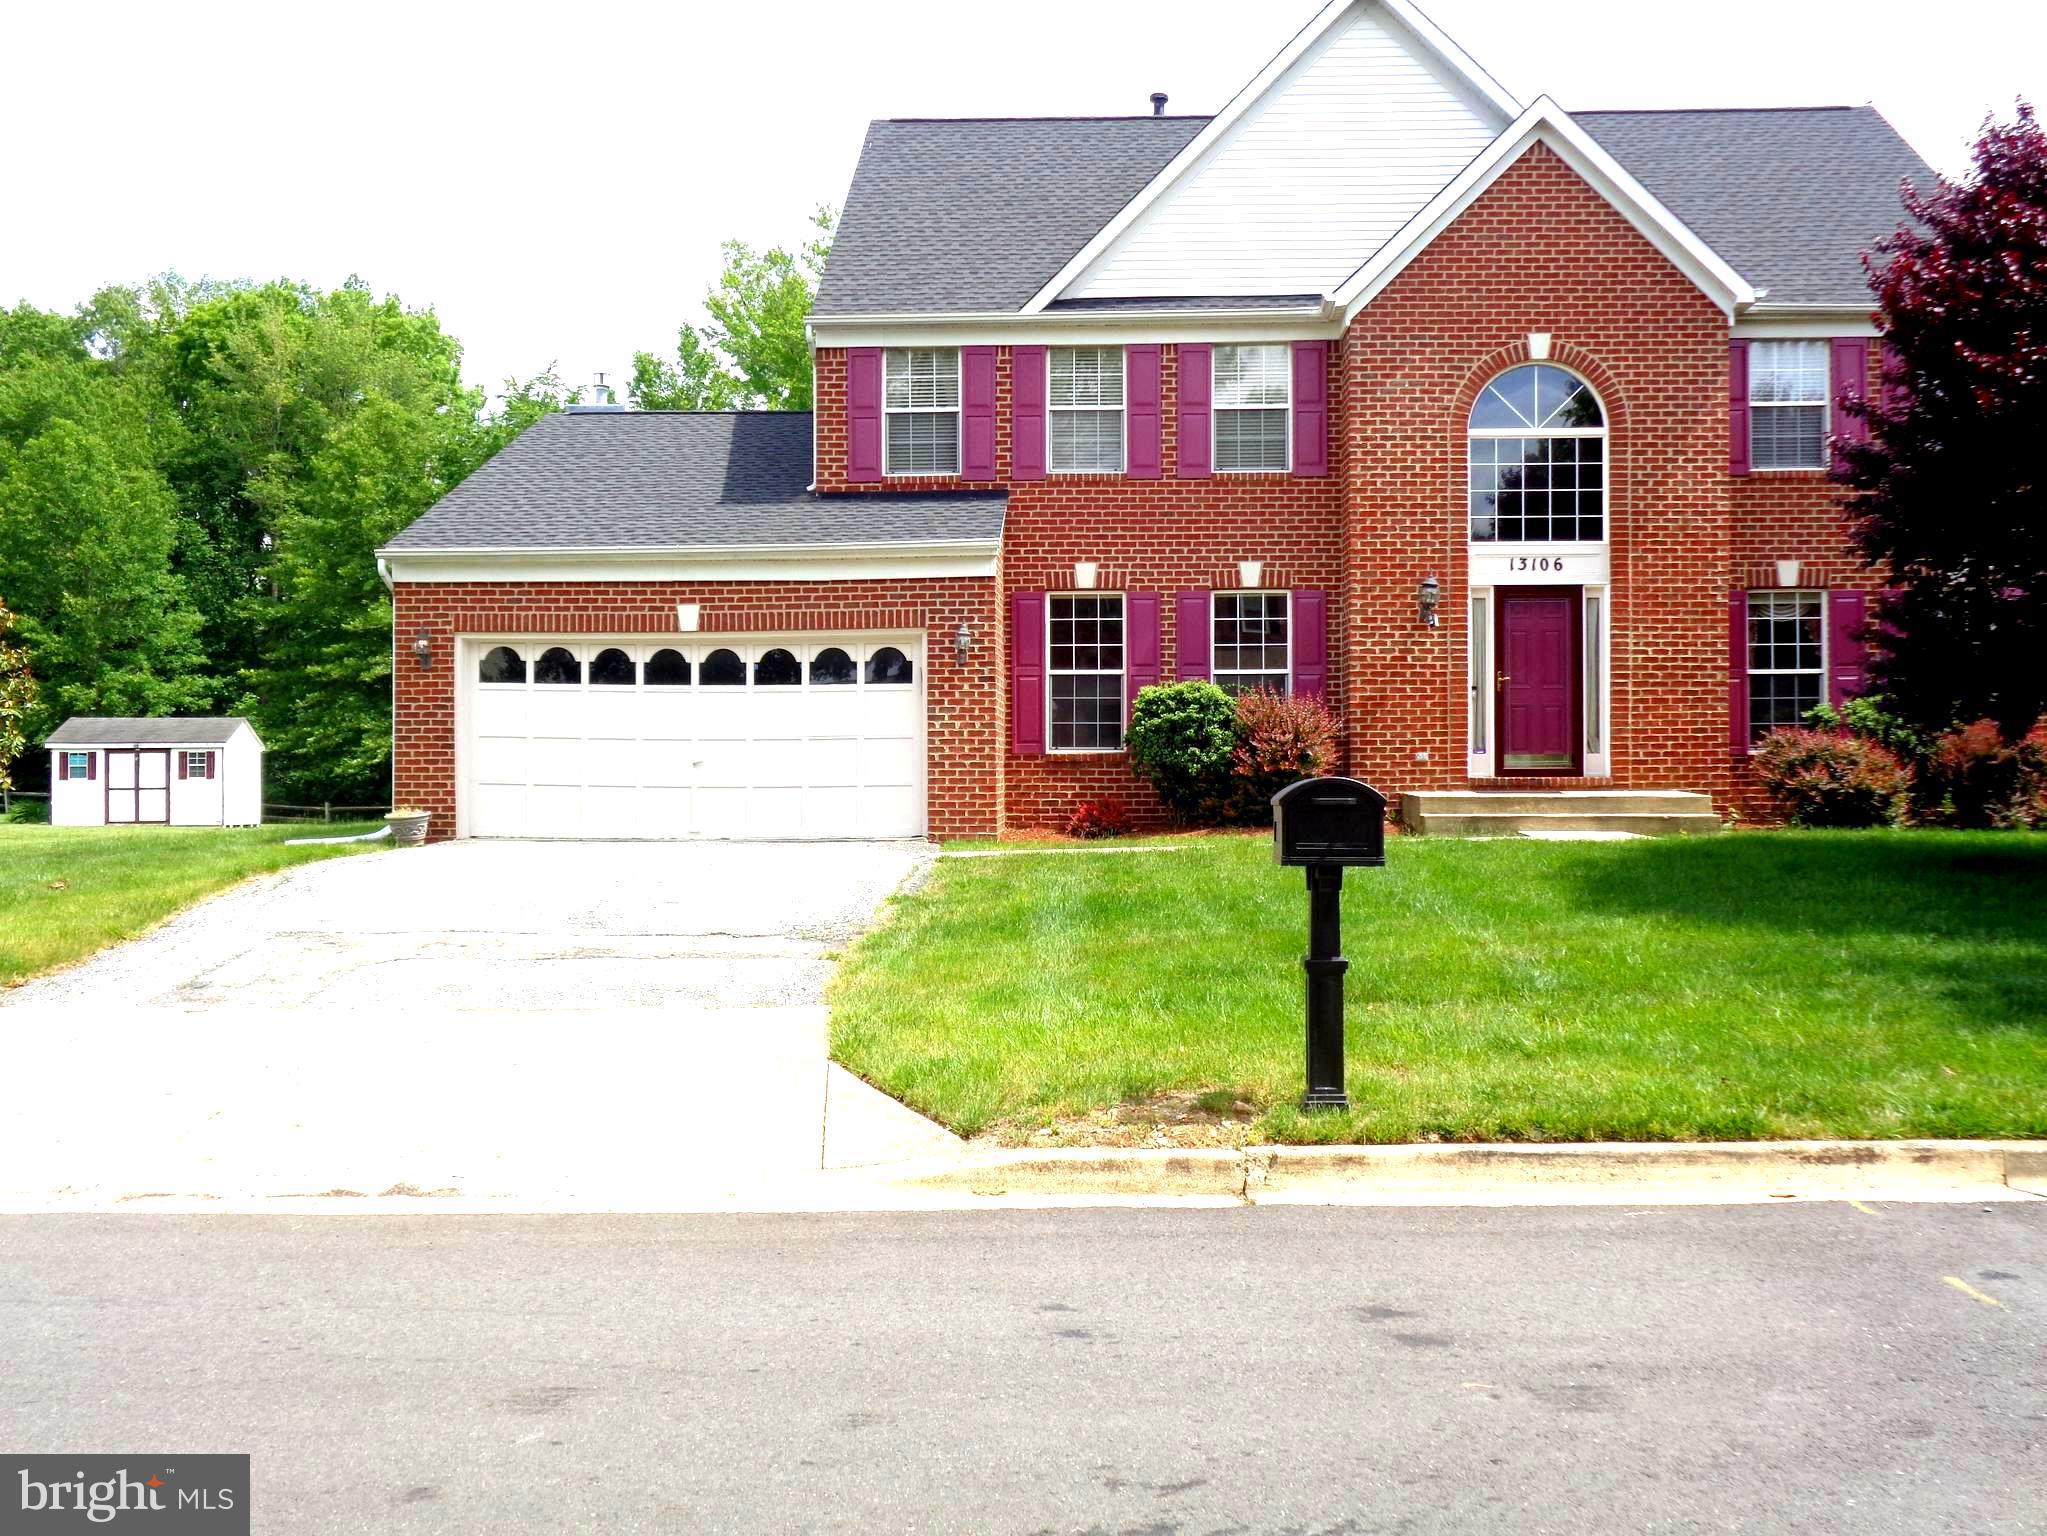 13106 Jervis St, Clinton, MD, 20735